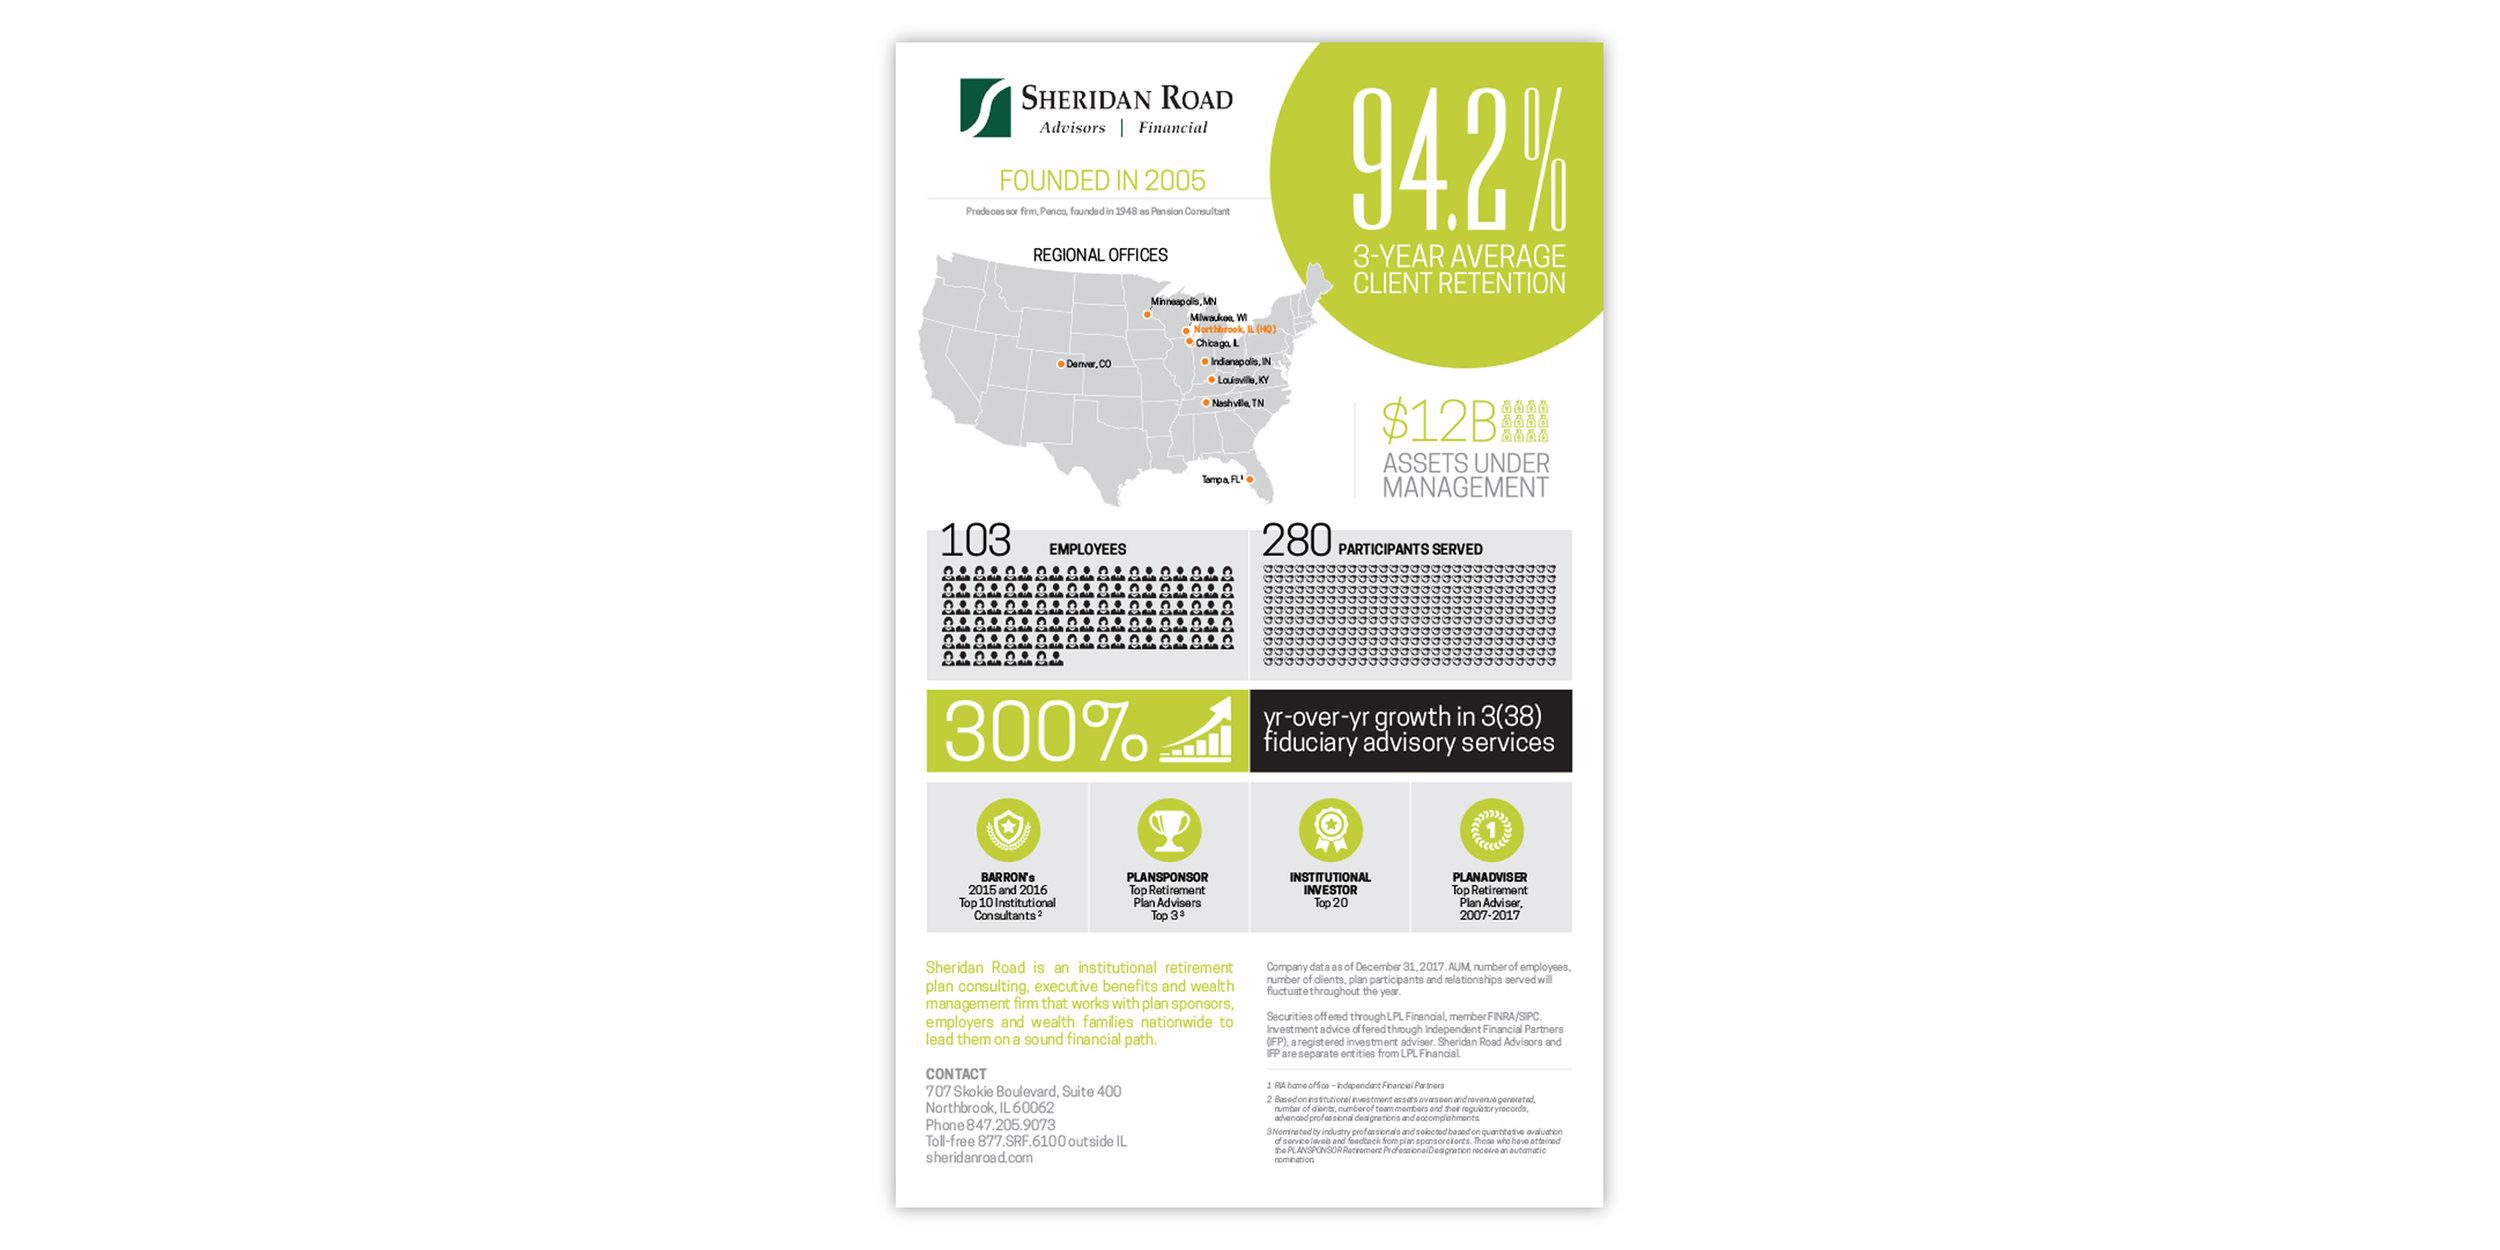 Web_Samples_Infographic.jpg